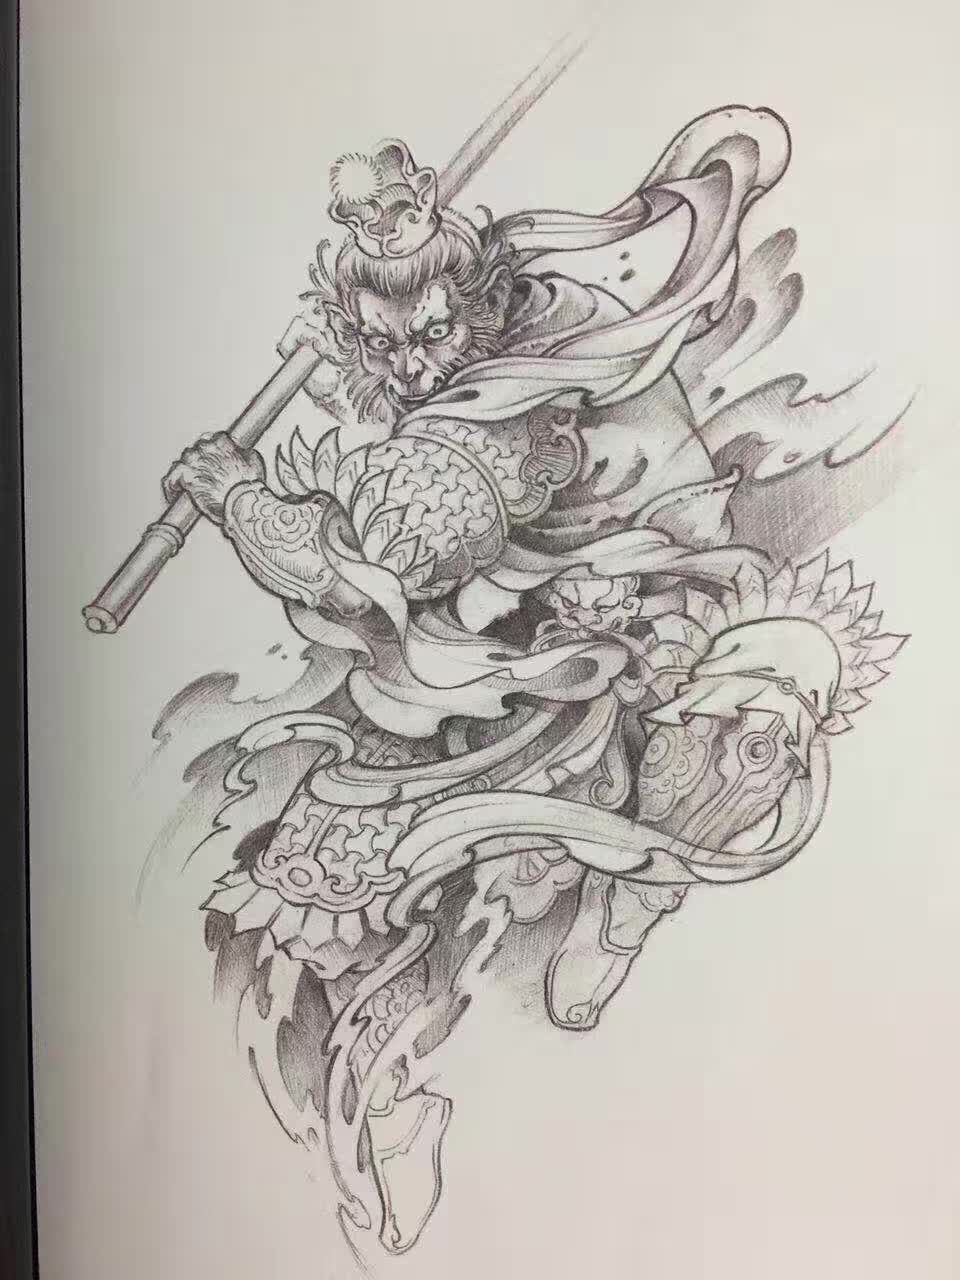 Samurai Japonese Girl Tattoo Design Tattoo Designs For Girls Female Samurai Tattoo Japanese Girl Tattoo